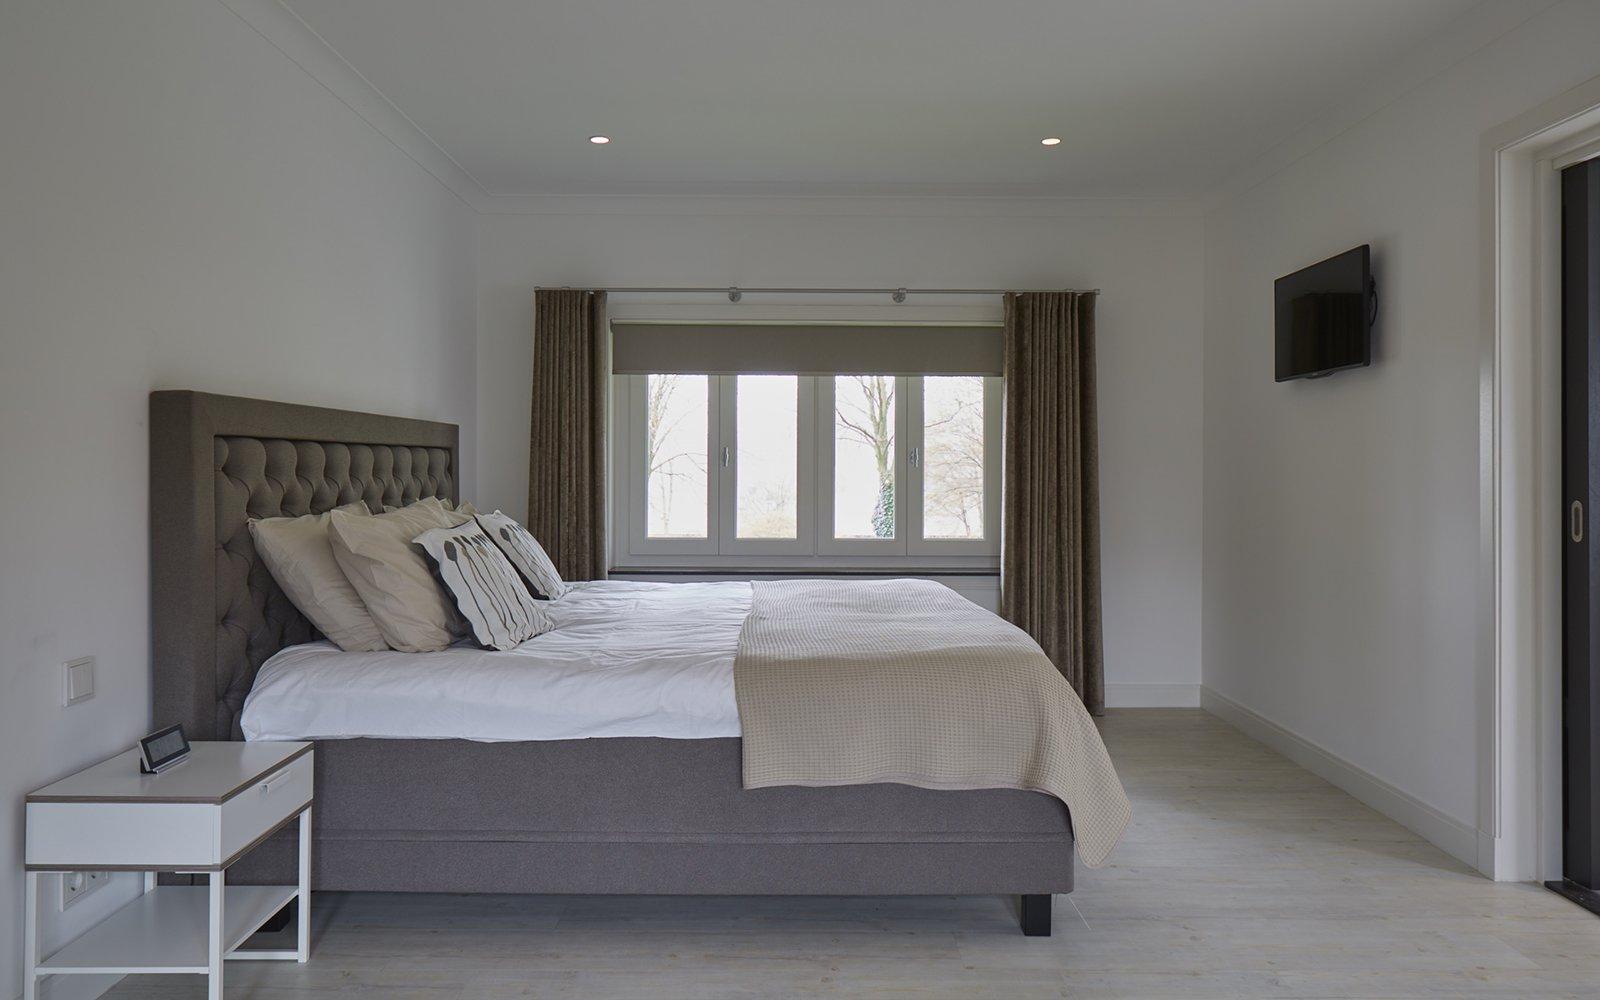 Luxe badkamer, Badkamer inspiratie, Marco Daverveld, Master bedroom, Klassiek, Modern